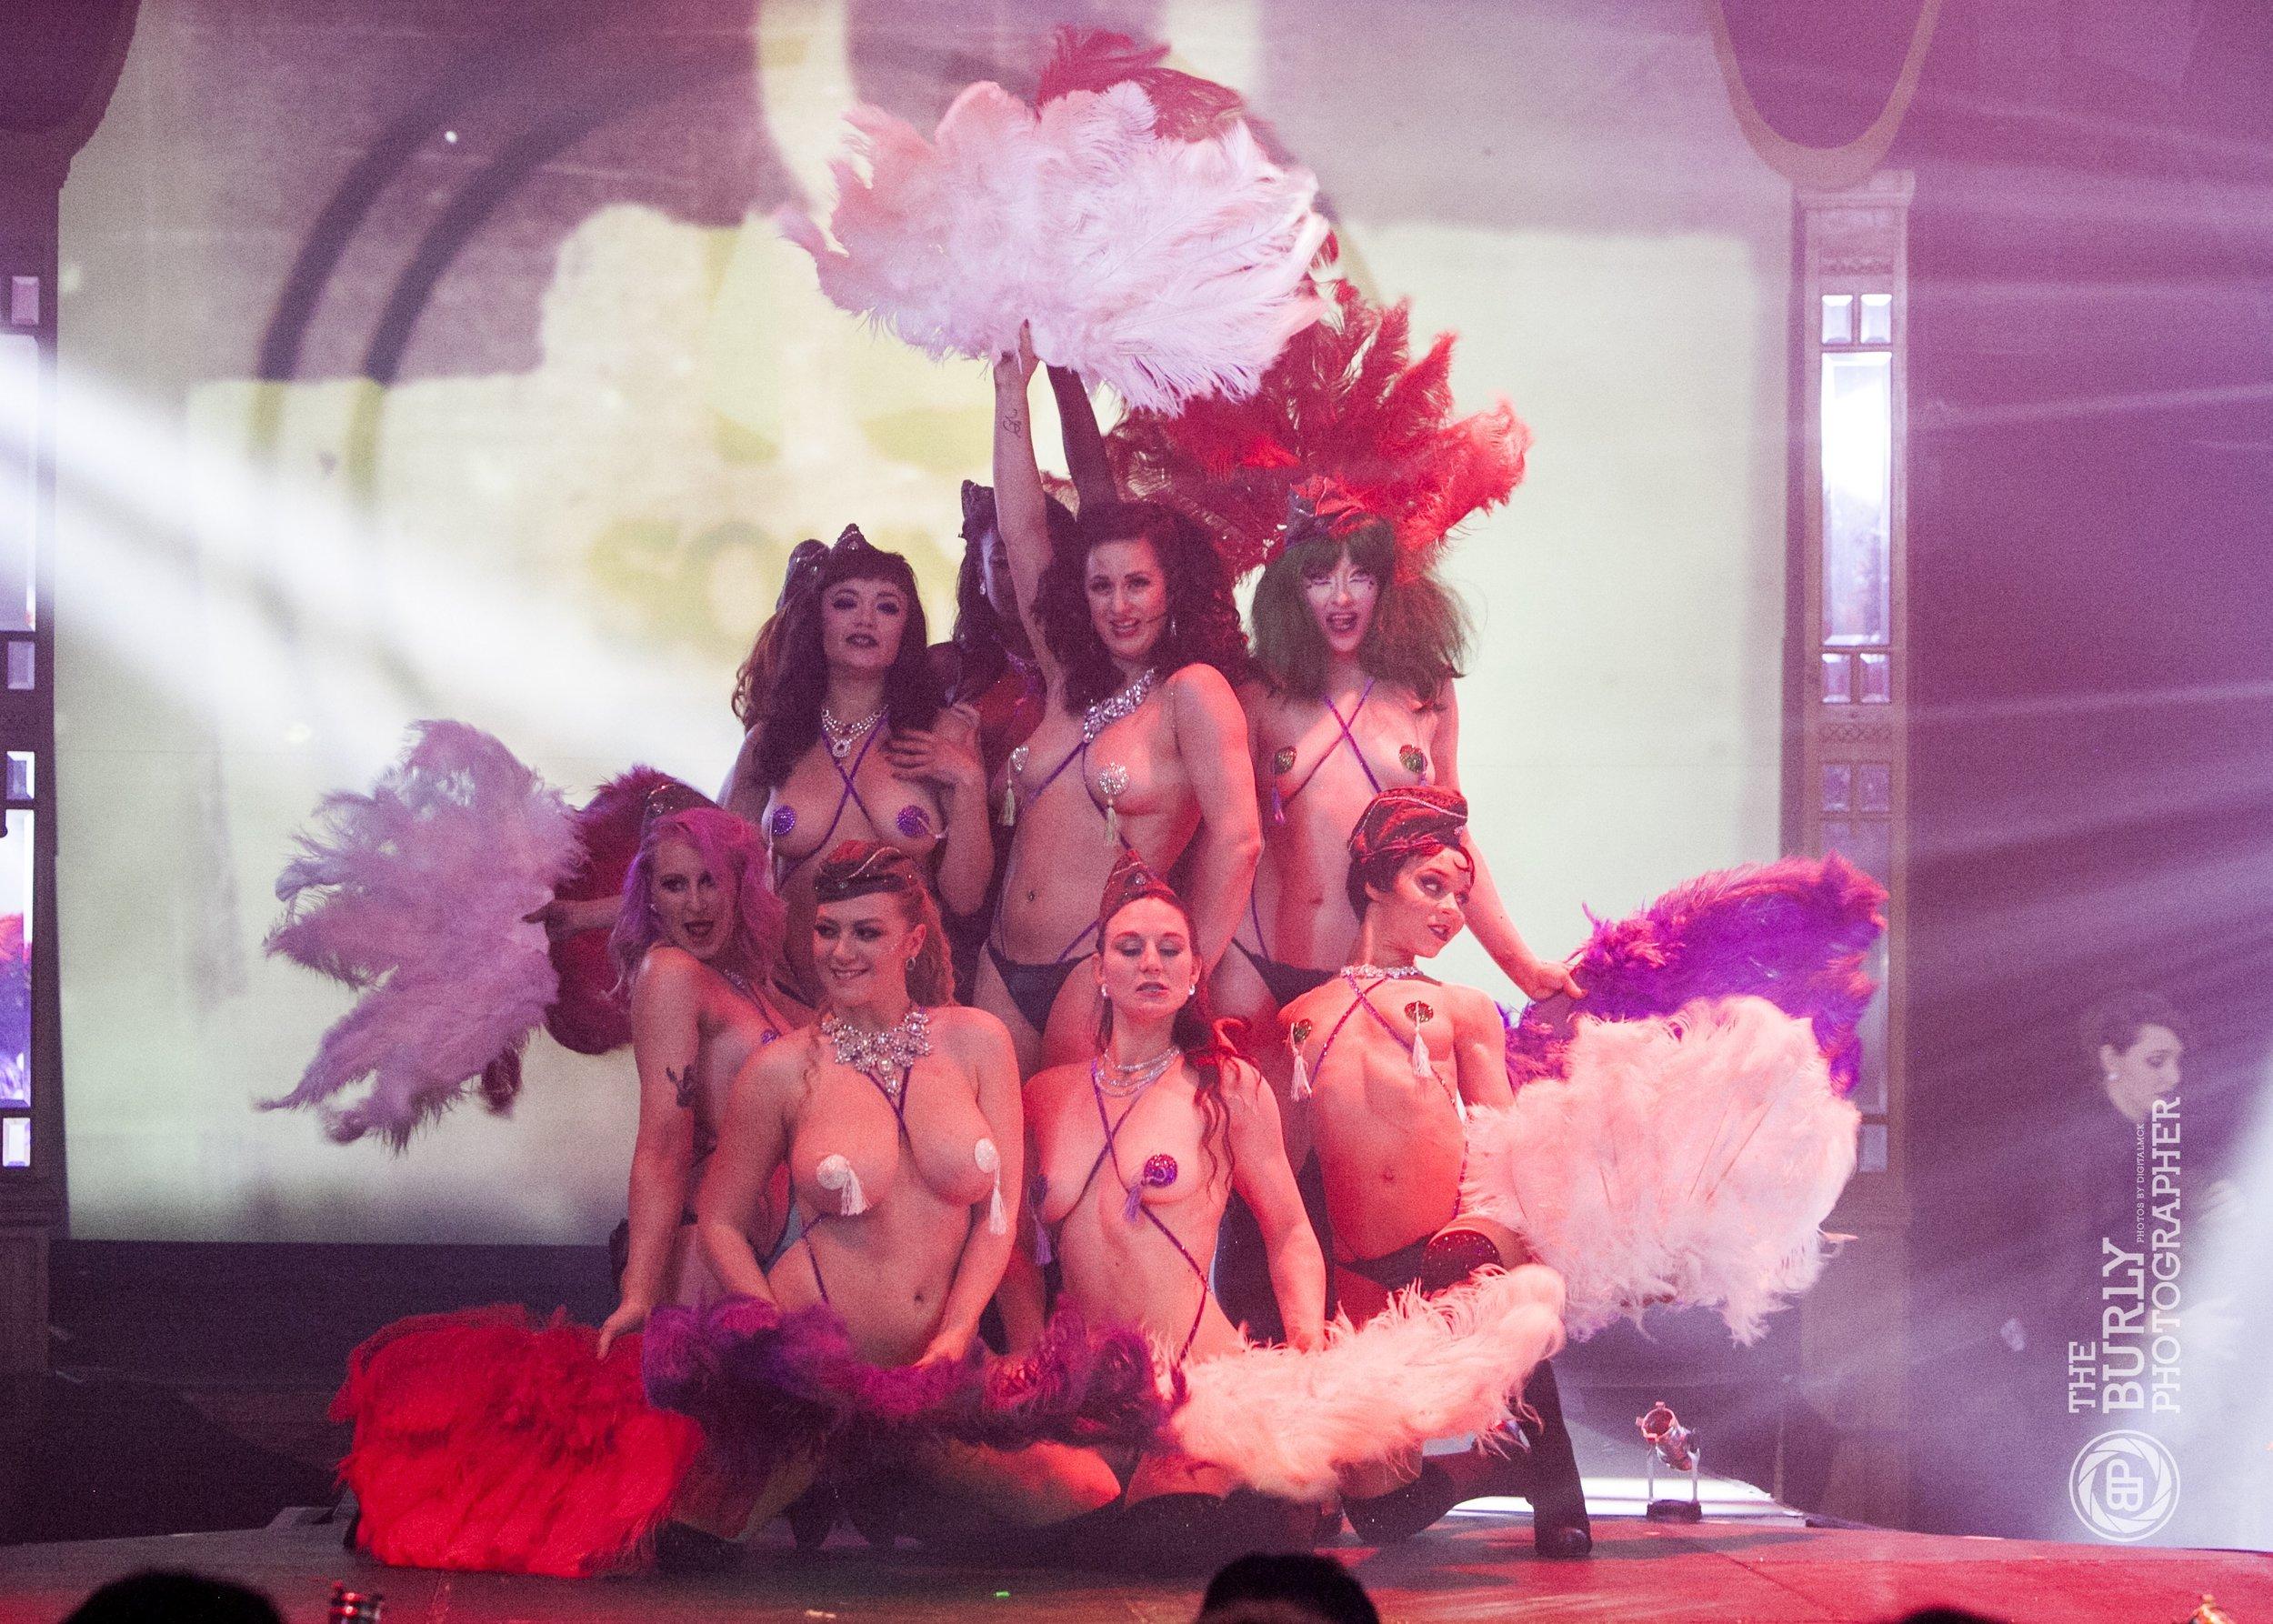 House of Burlesque 2.0